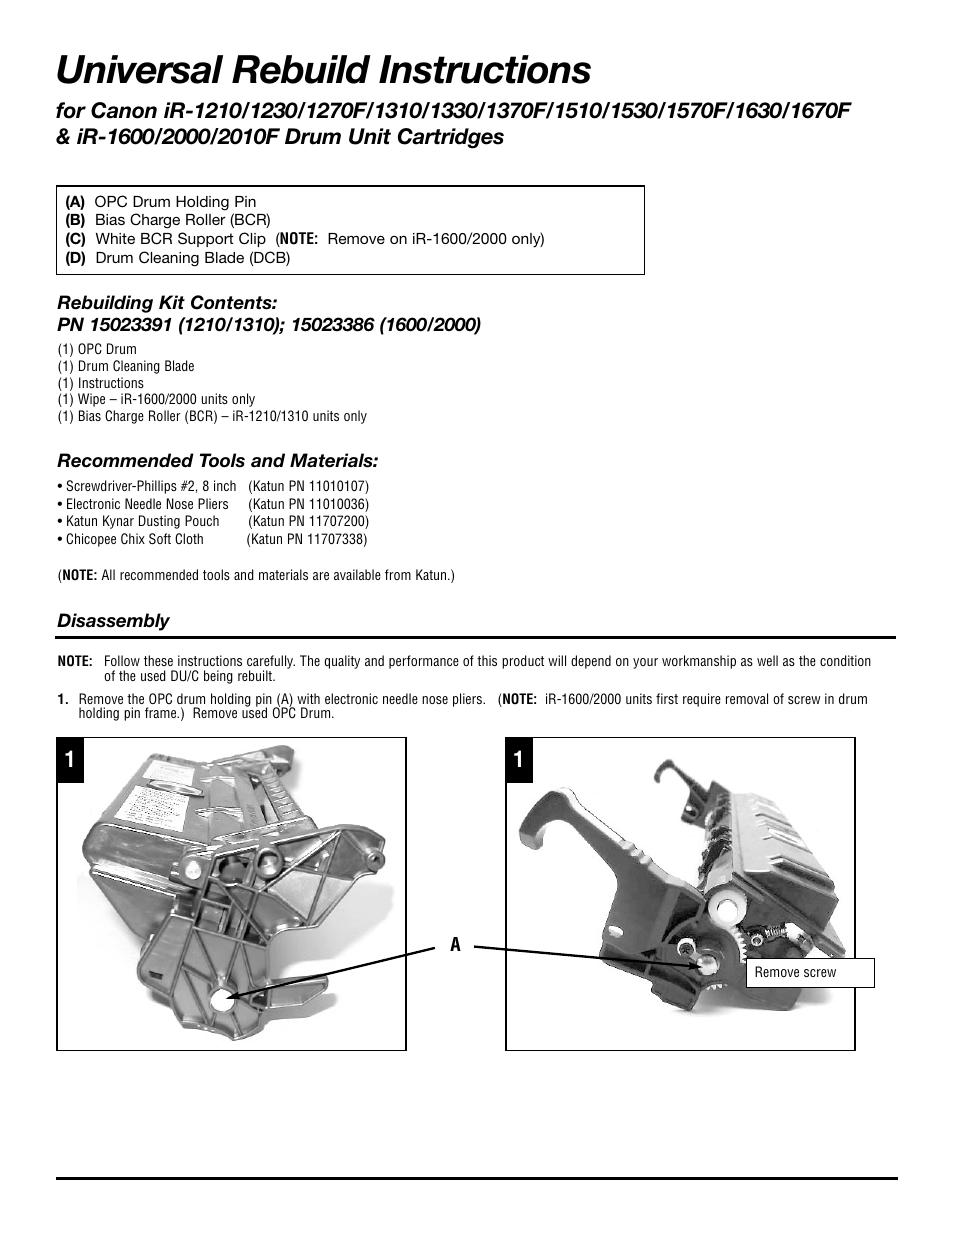 universal rebuild instructions katun canon ir 2000 drum unit rh manualsdir com canon ir 1600 service manual pdf canon ir 1600 manual